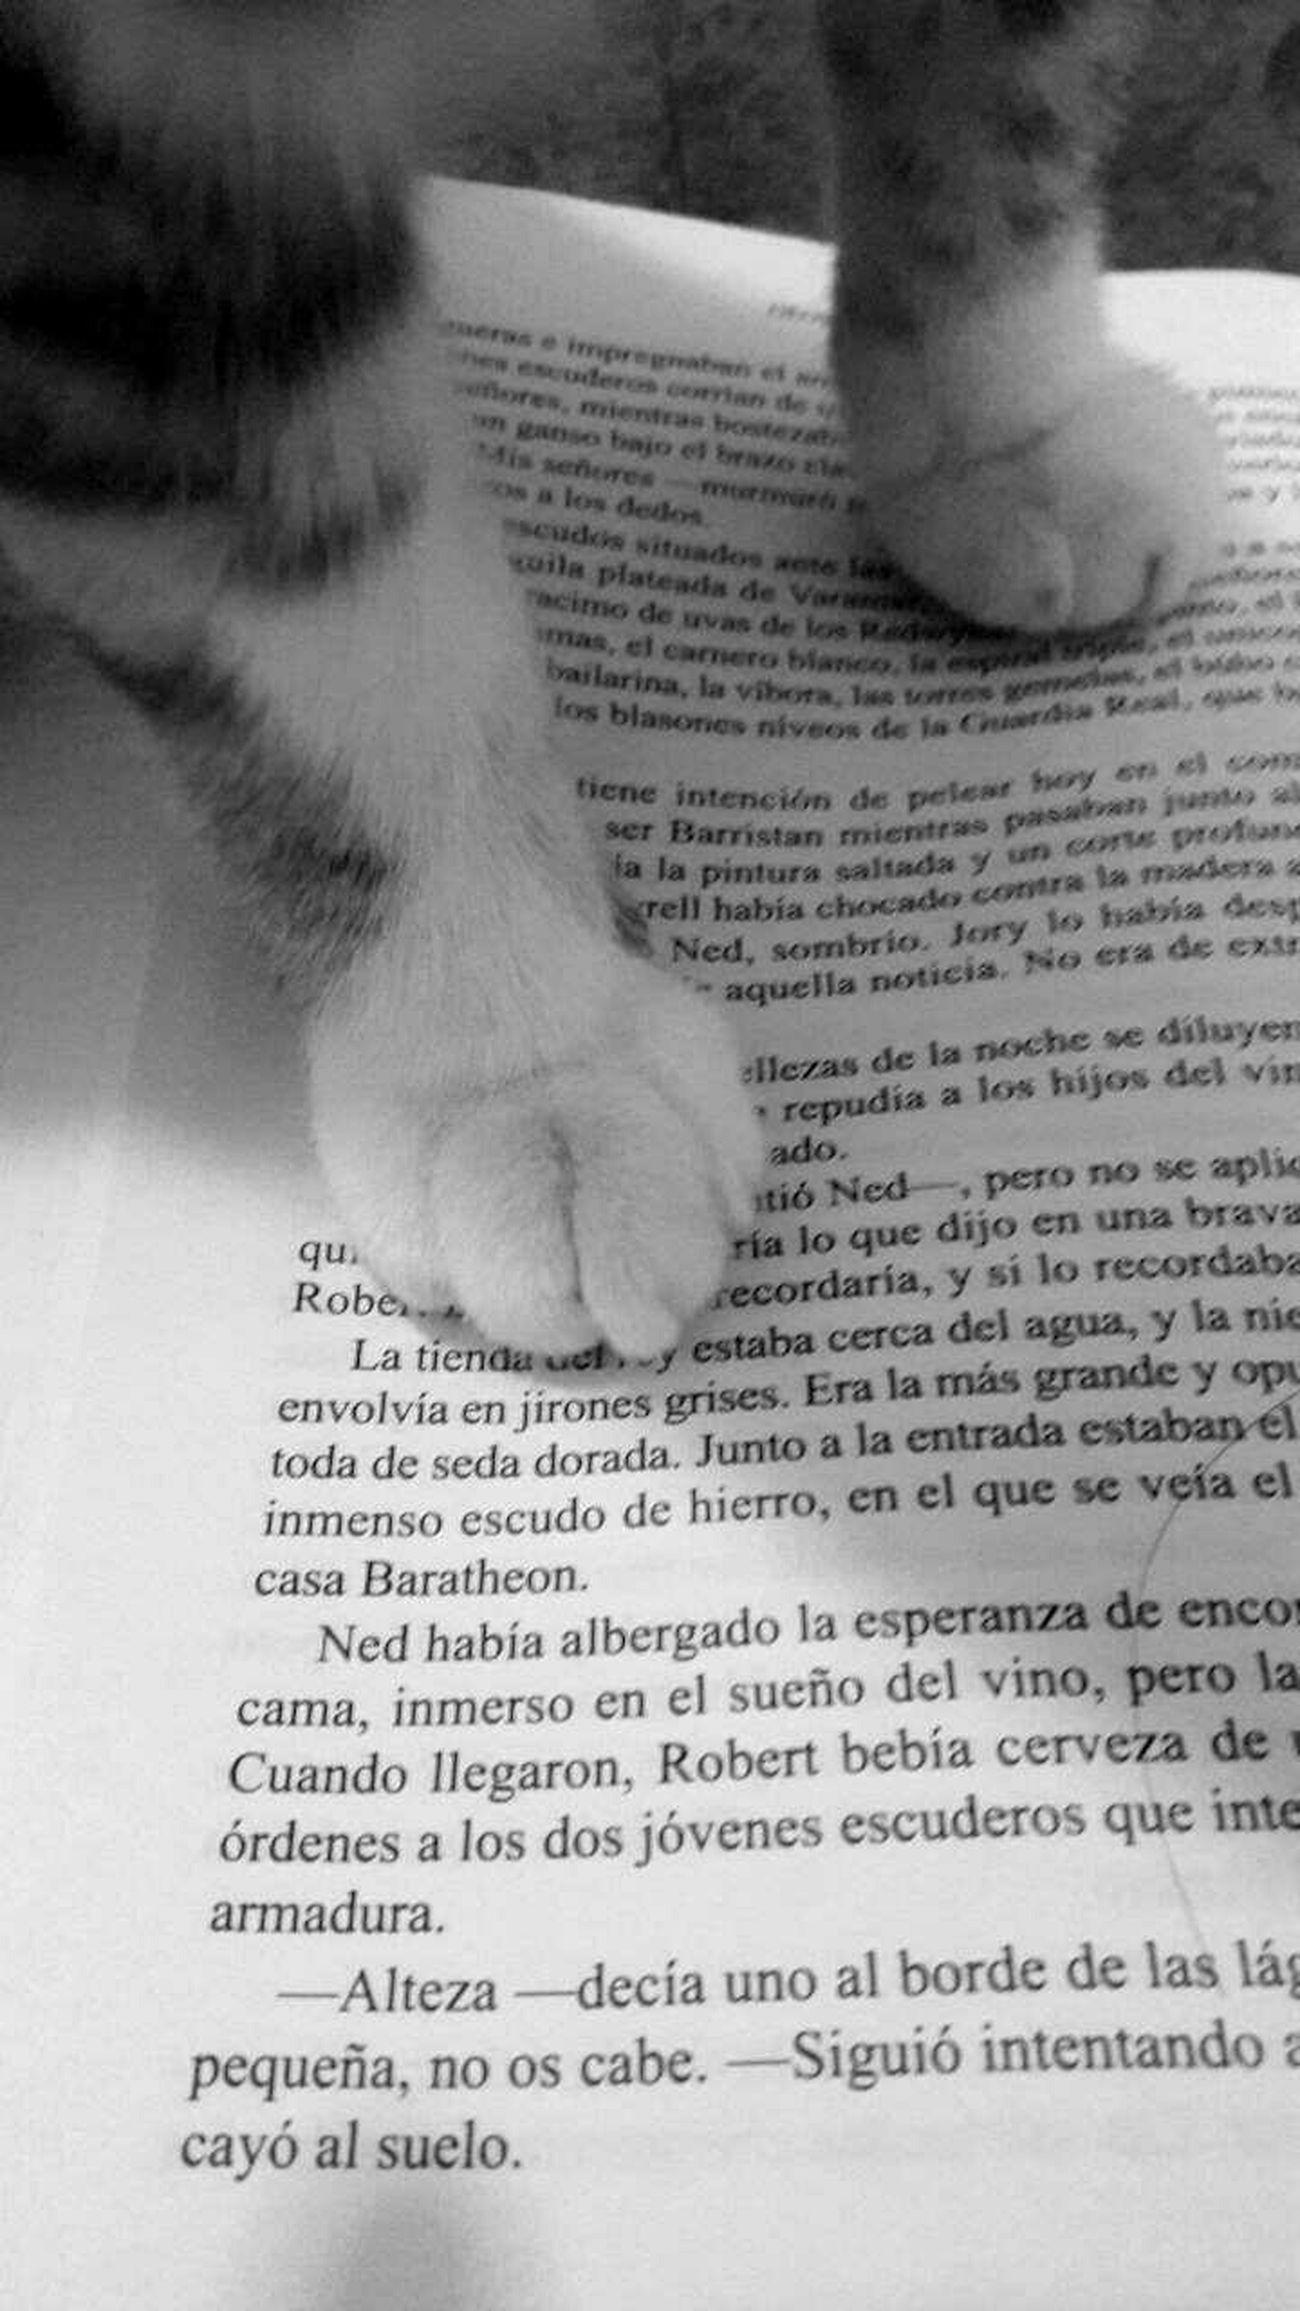 ❤ Cat Kitty Kitty Cat Gato Gatito Gata Gatita  Book Libro Words Pet Balck And White Blanco Y Negro Blanco Black White Legs Words